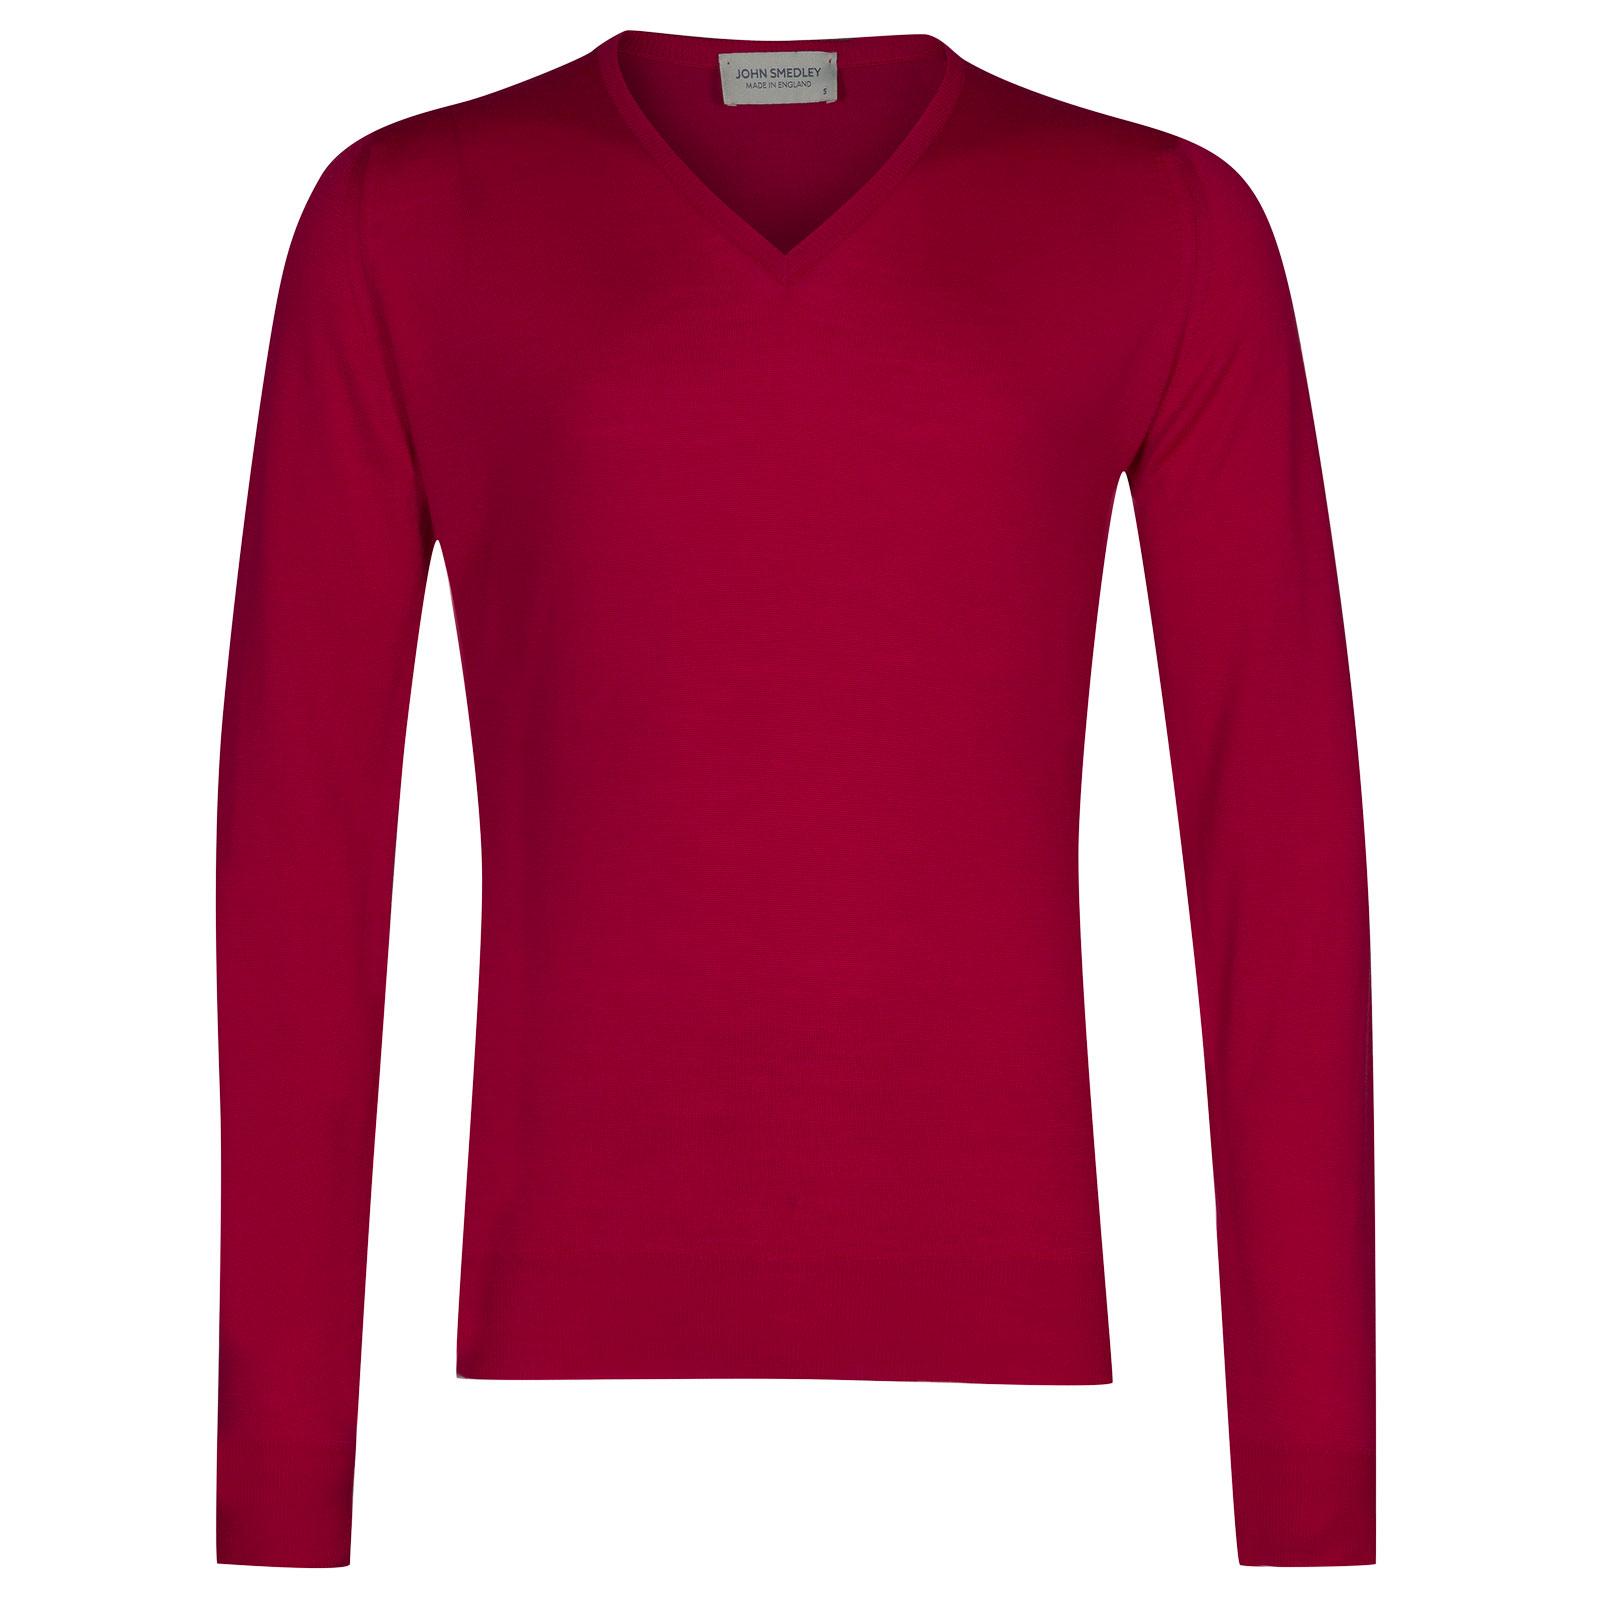 John Smedley Blenheim Merino Wool Pullover in Scarlet Sky-L